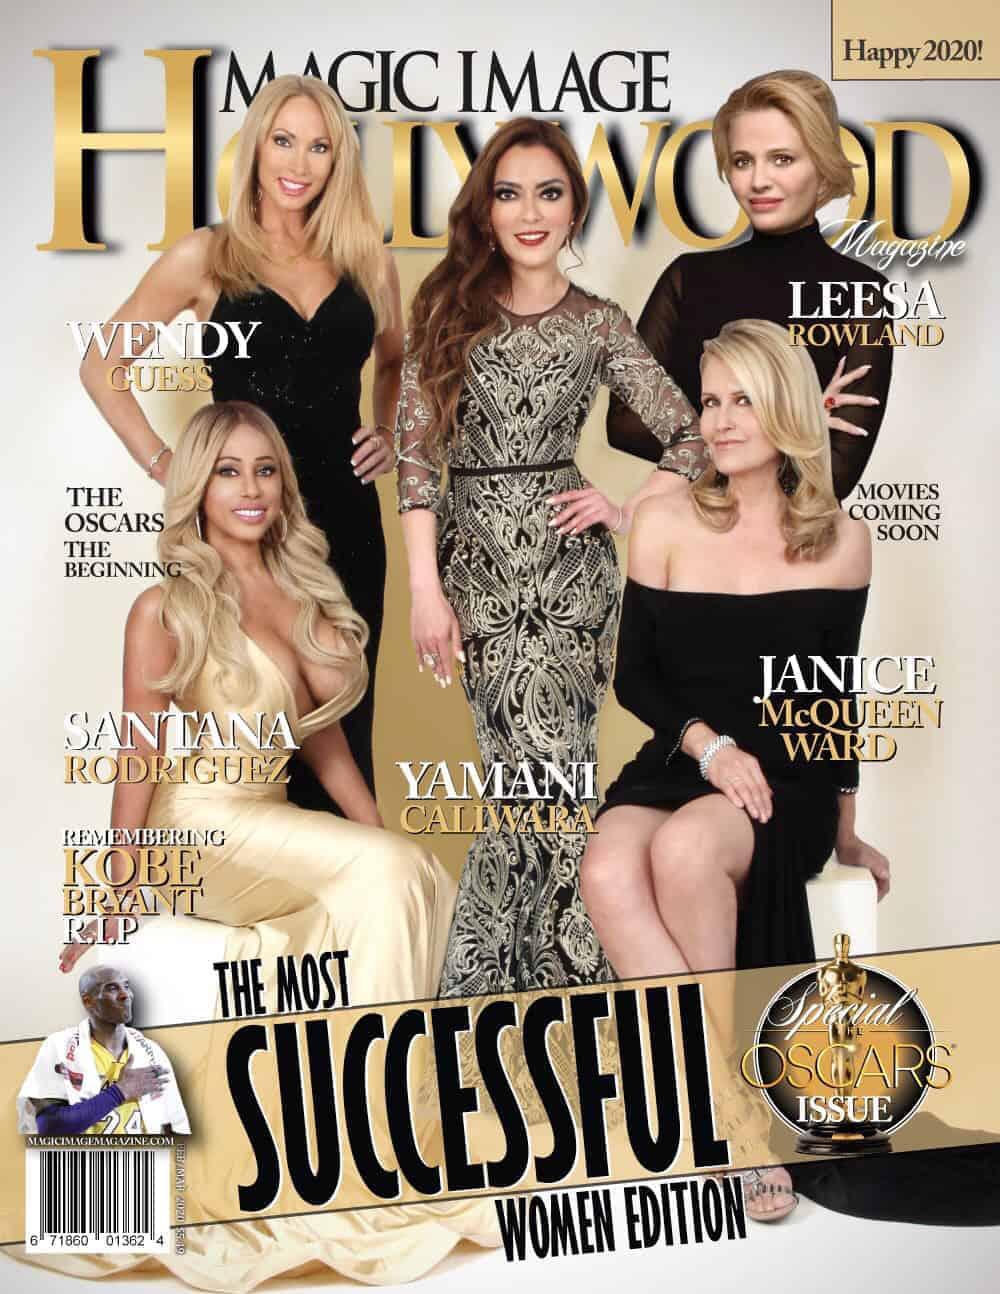 Magic Image Magazine Cover